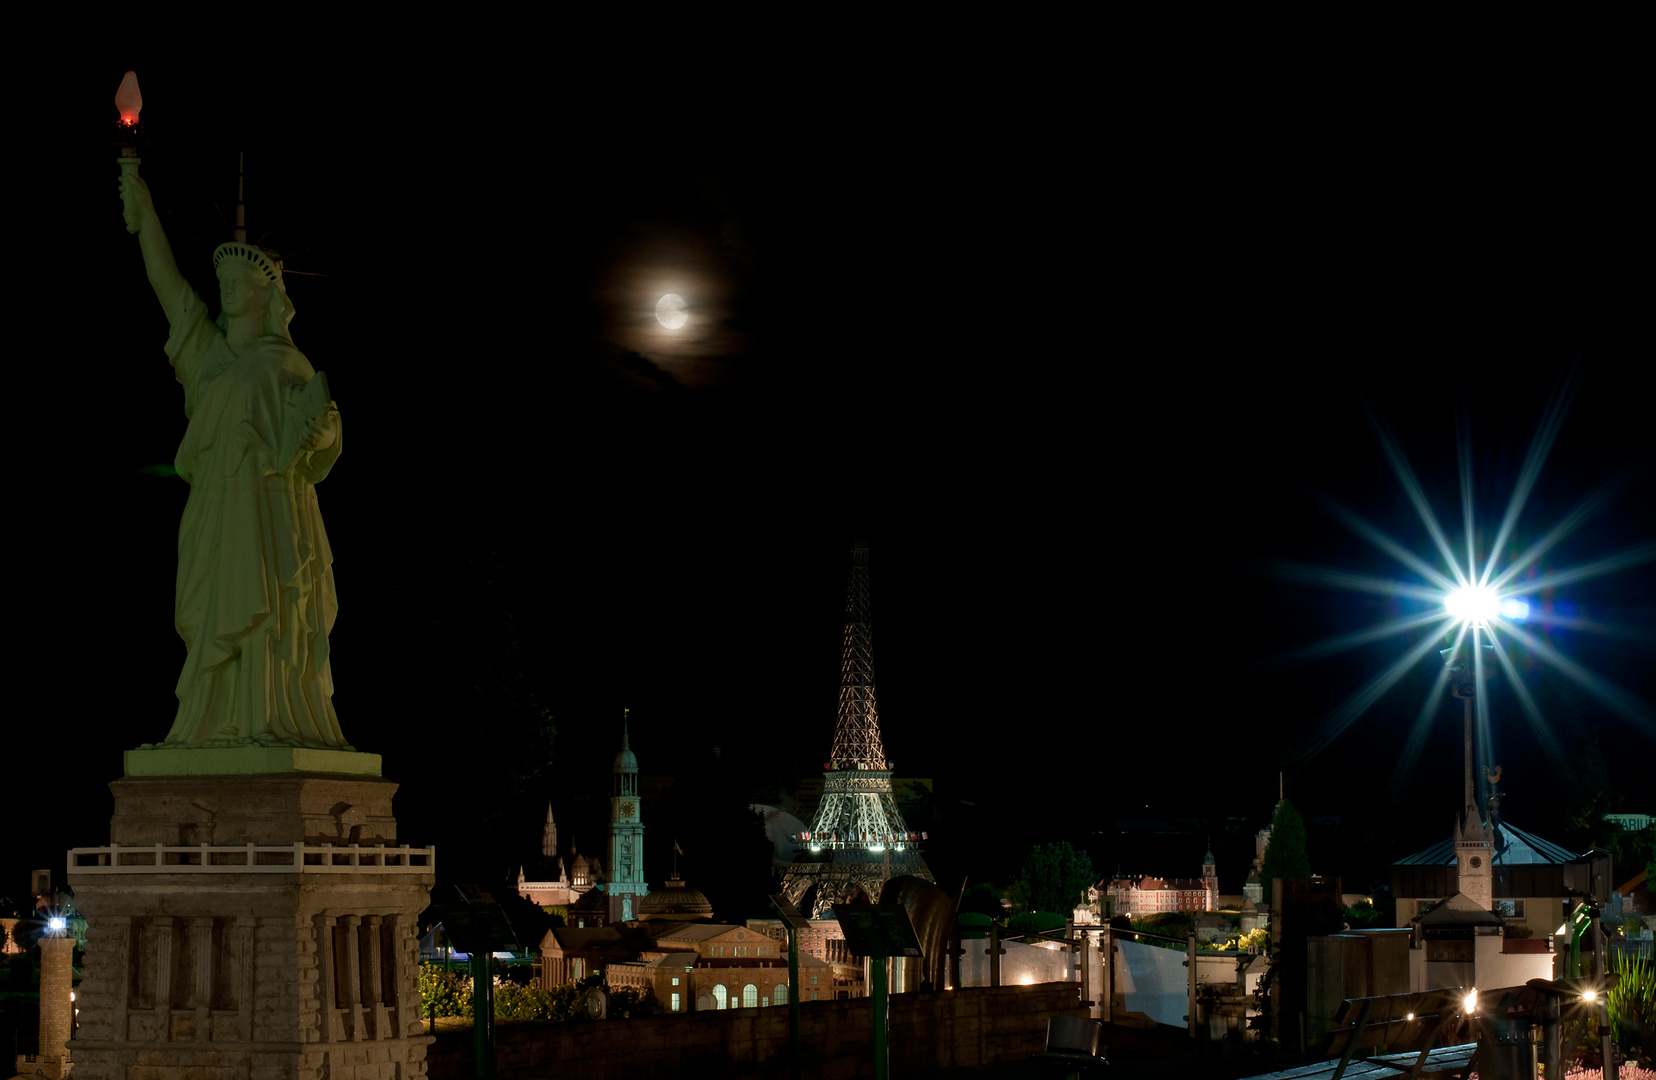 full moon - whole world